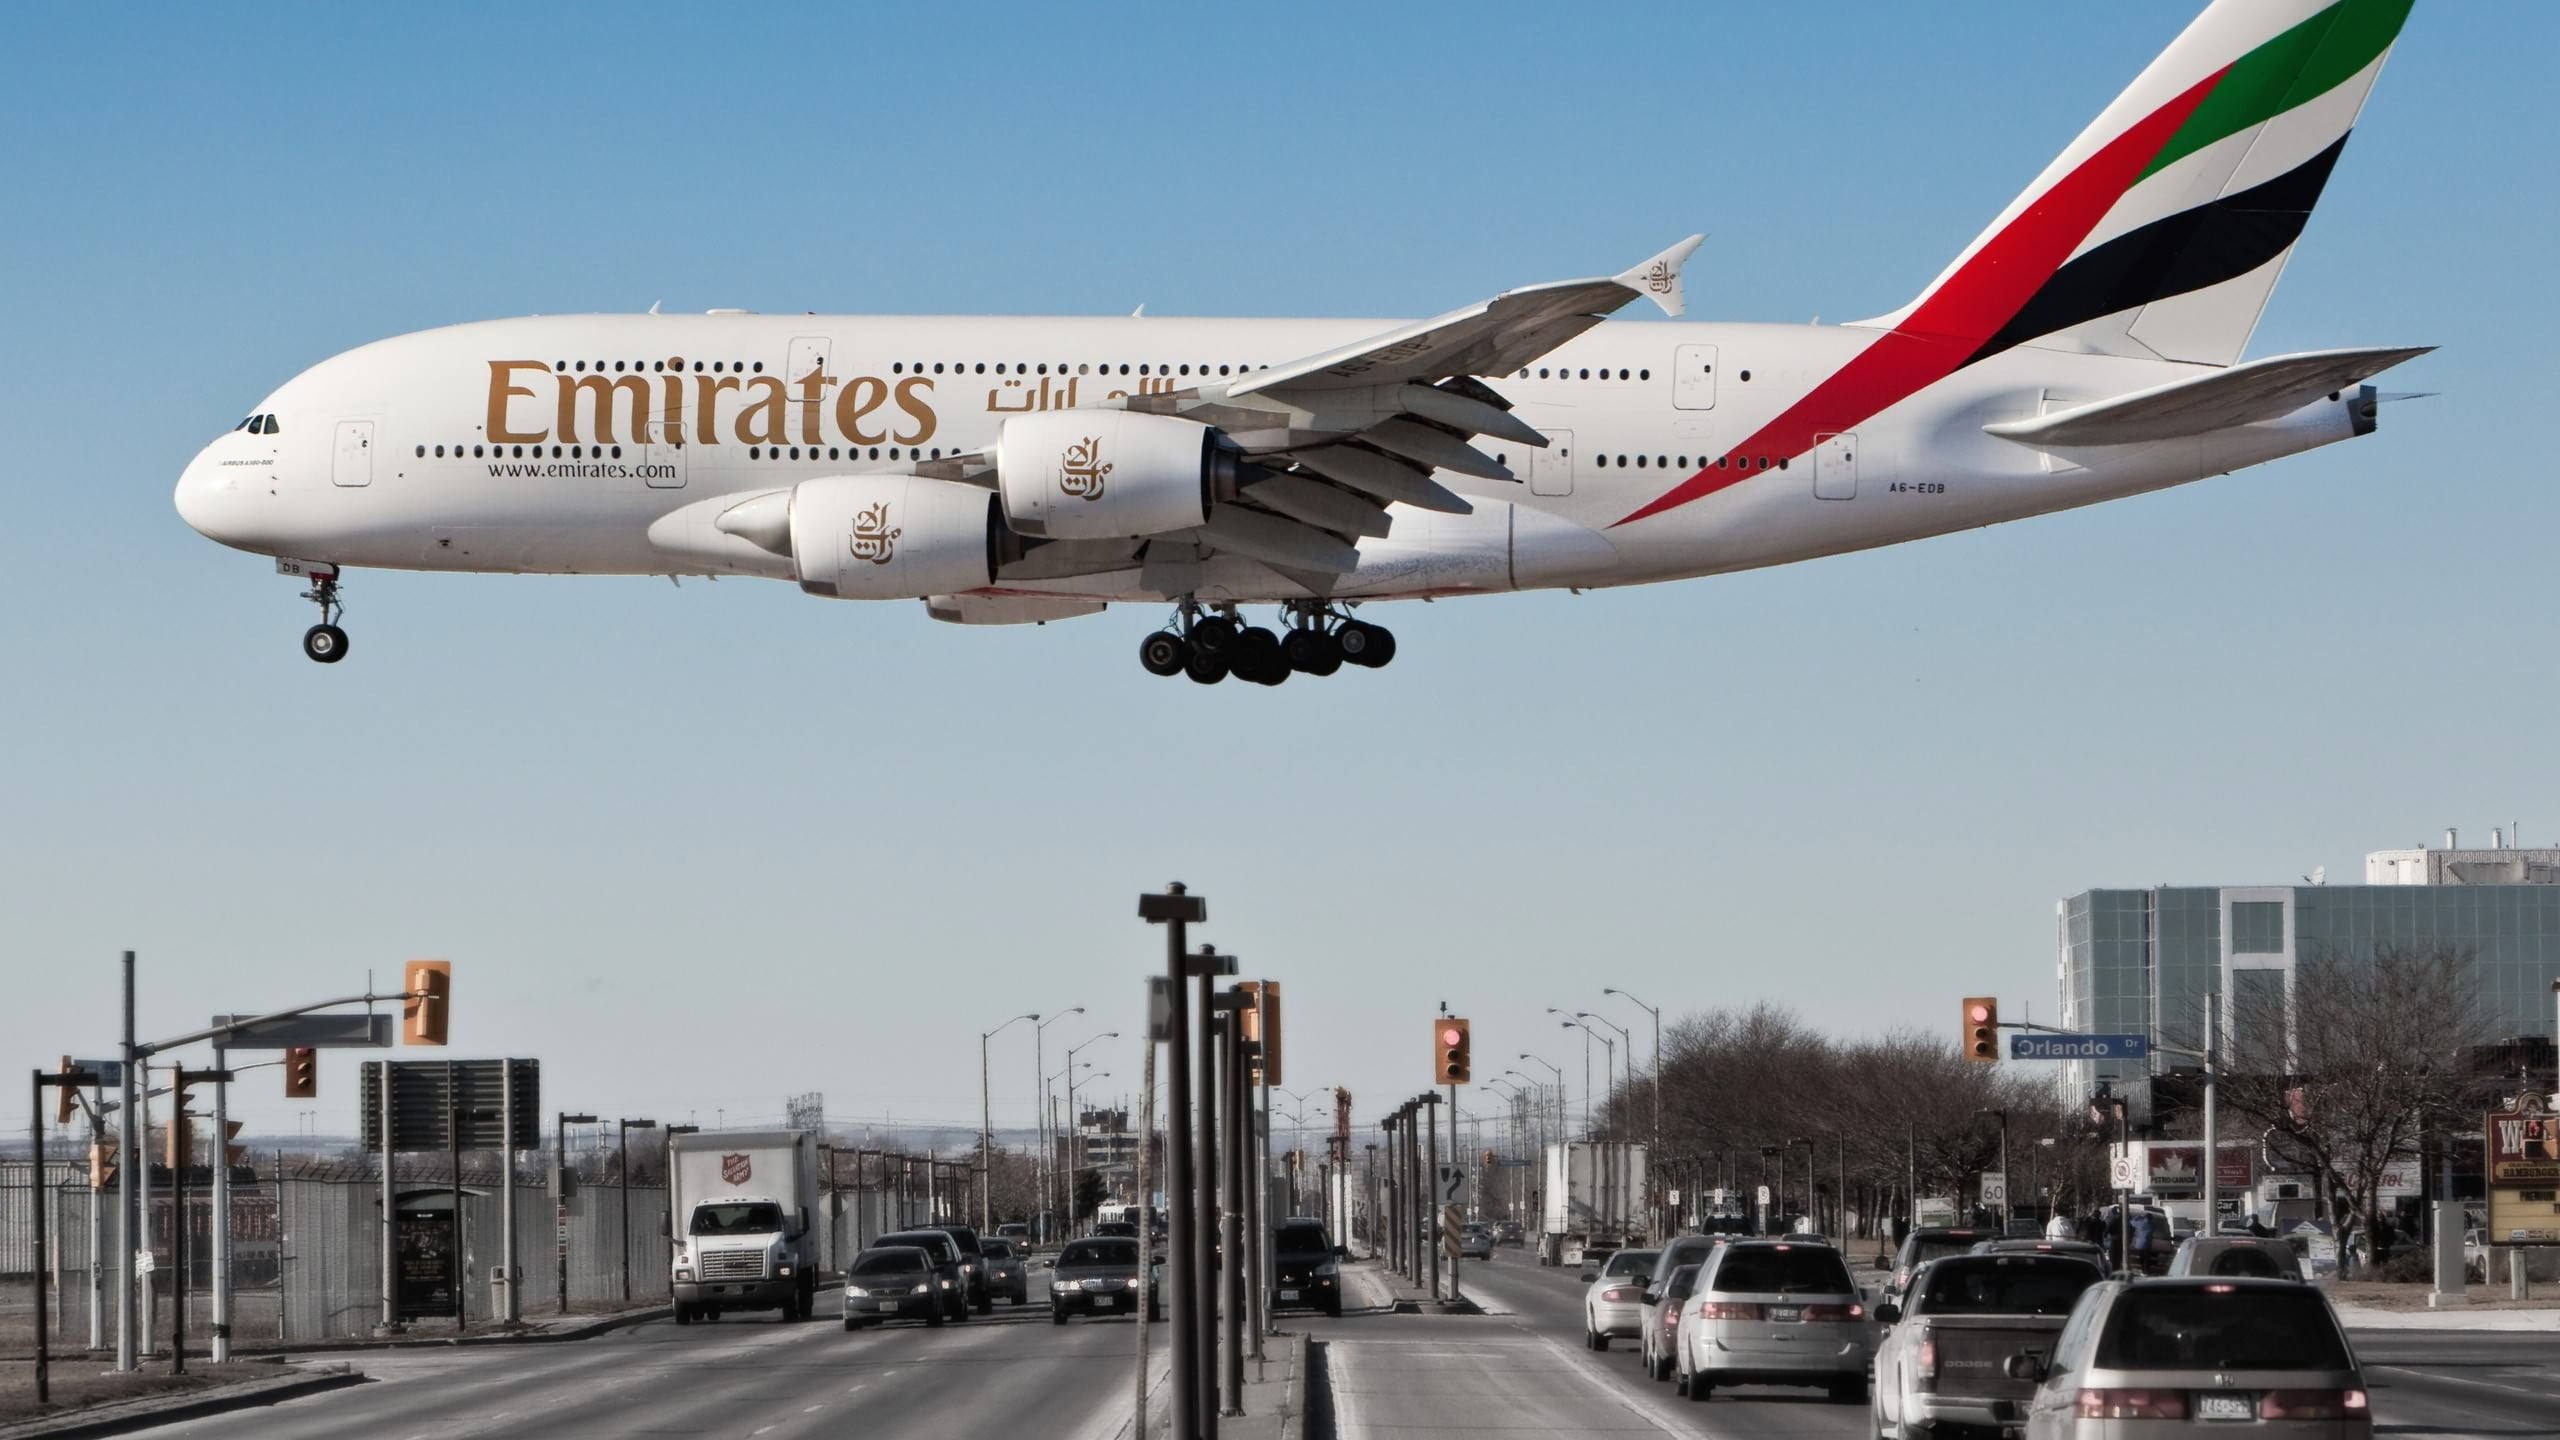 White Emirates plane below cars on road at daytime HD wallpaper 2560x1440